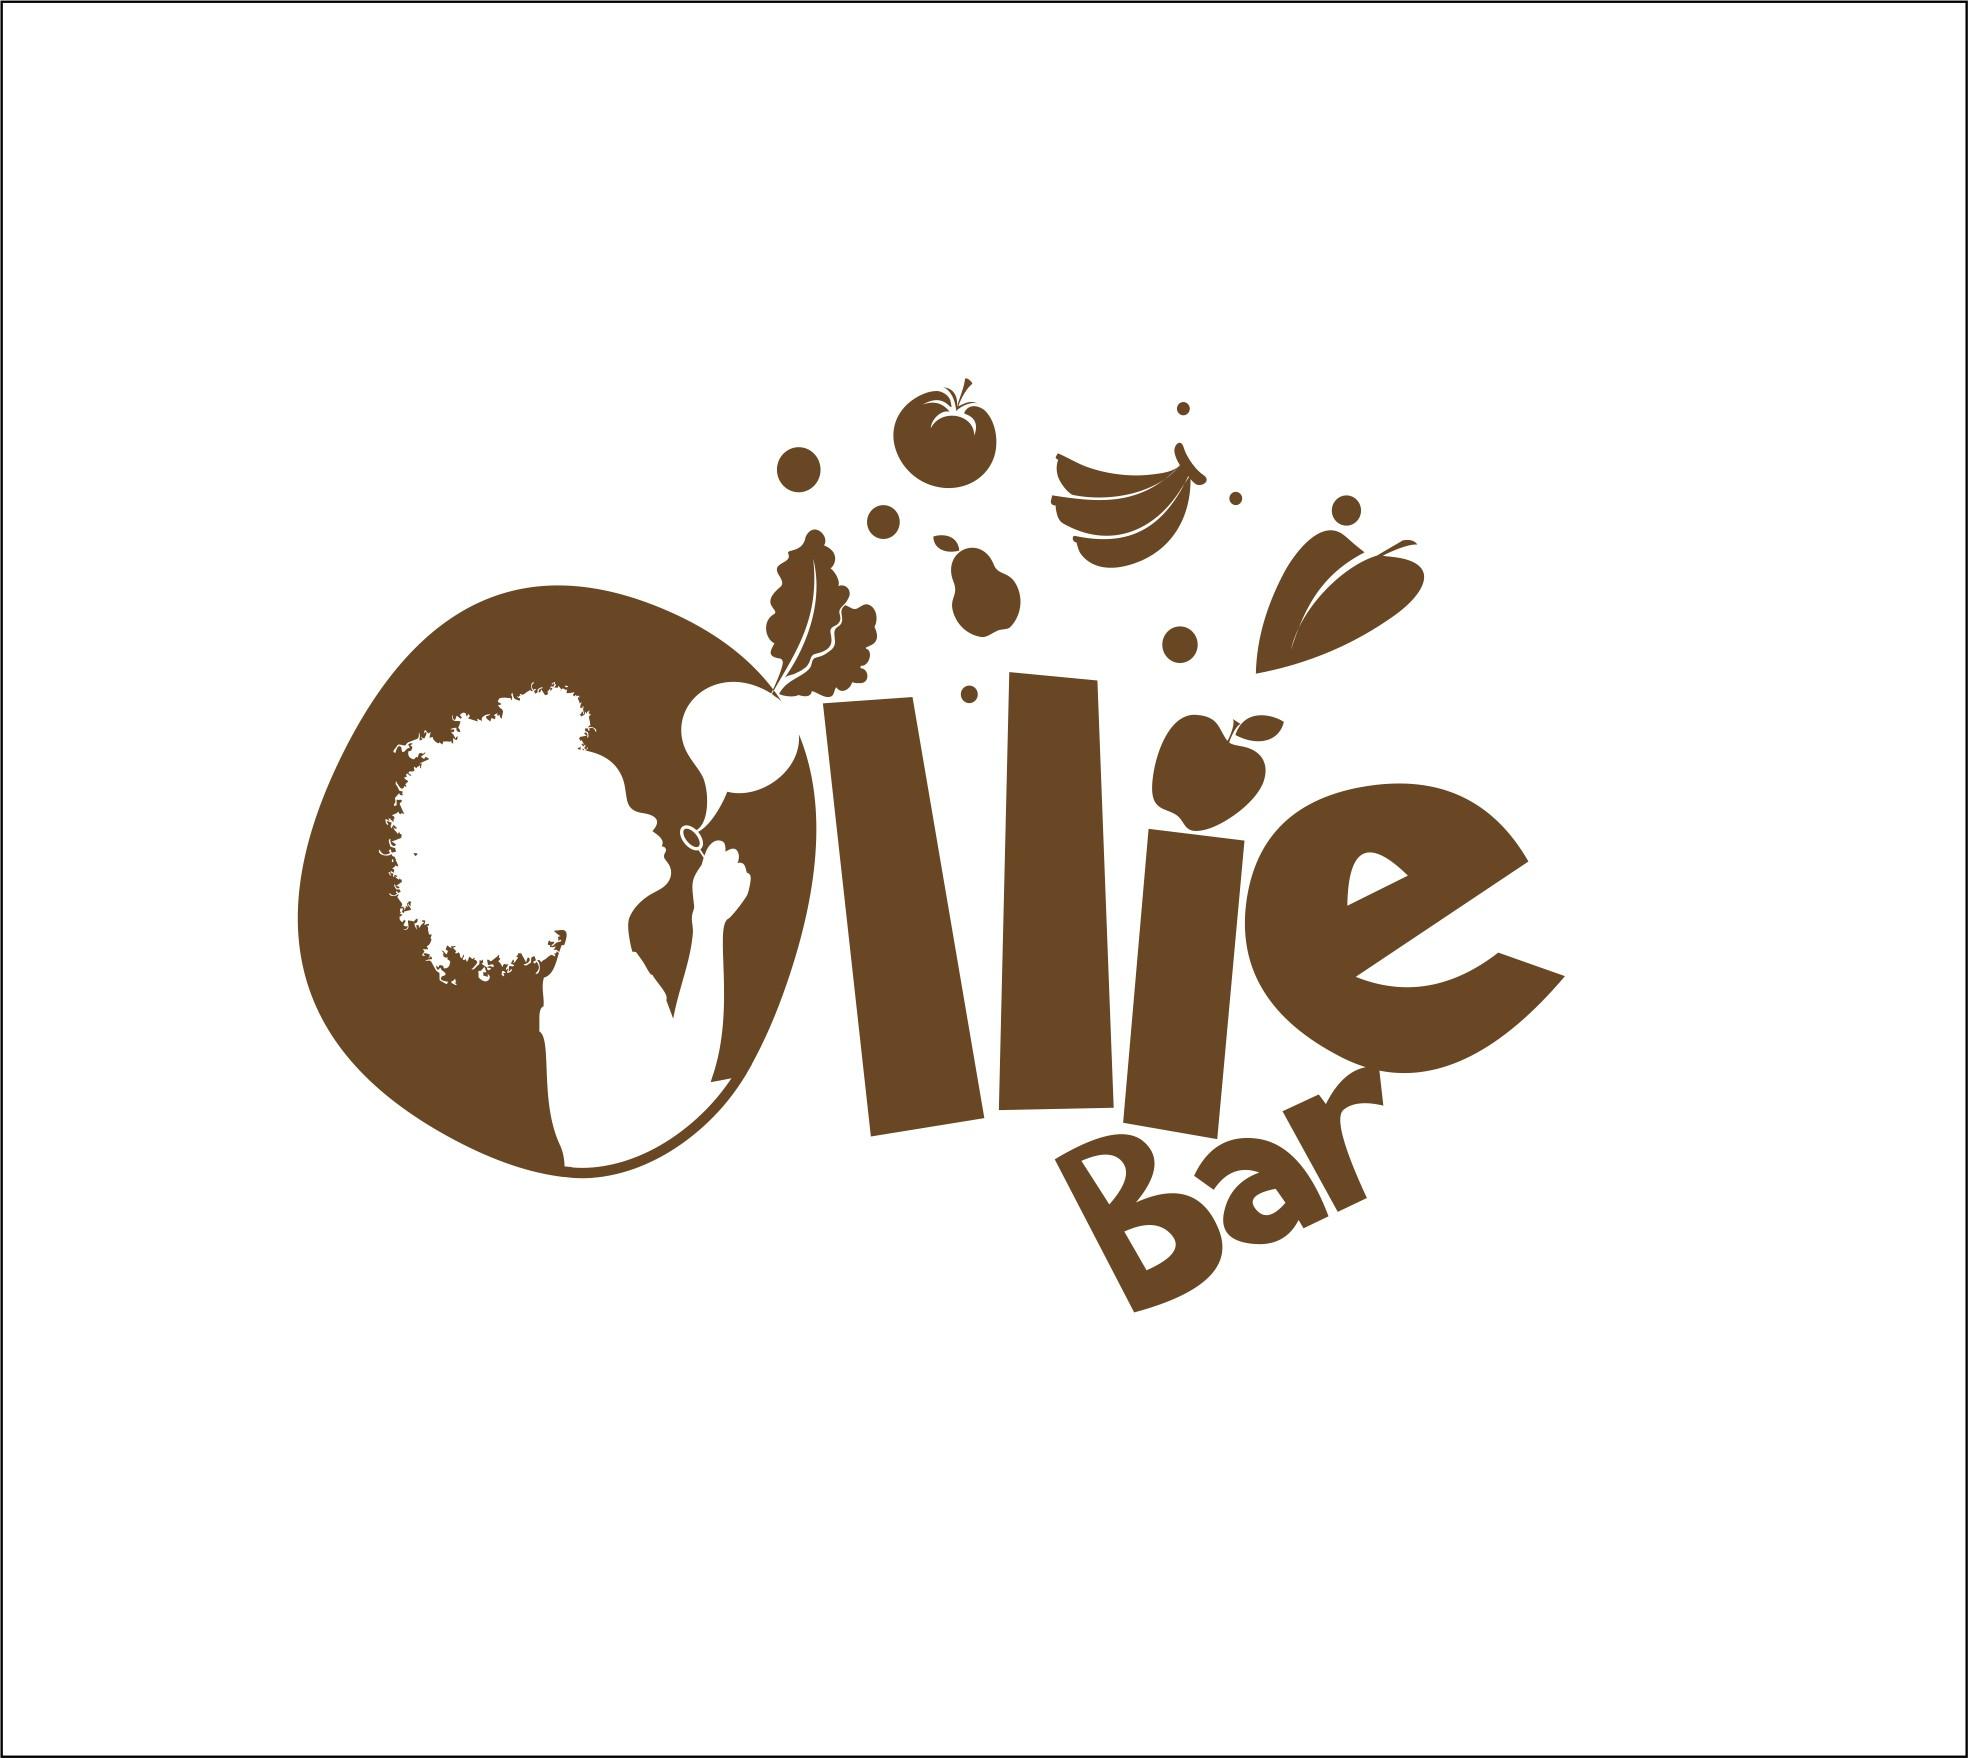 Design a playful logo for a children's snack bar